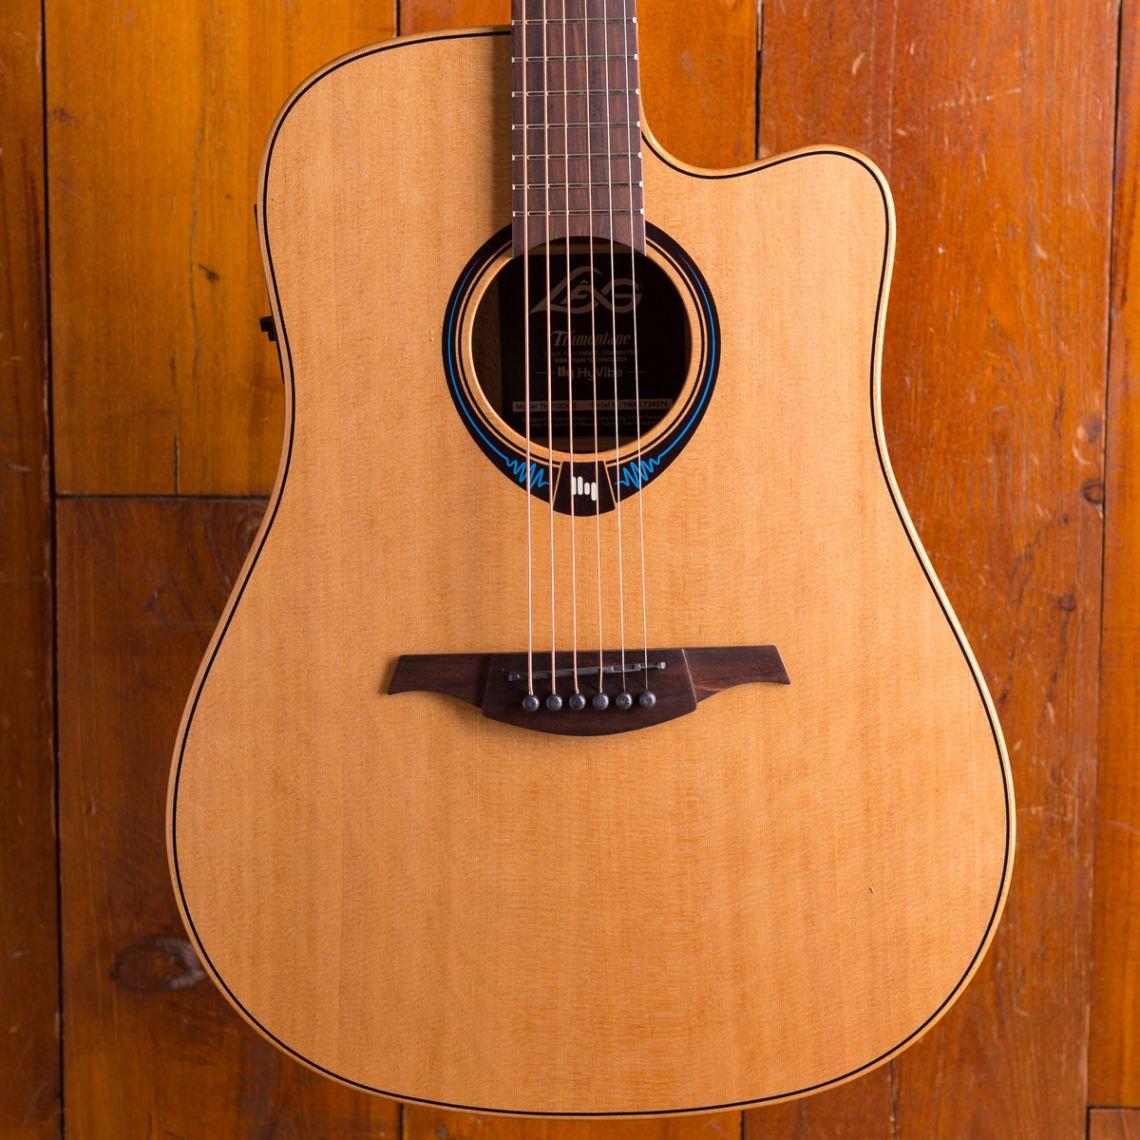 Tramontane Hyvibe 10 Satin Lag Max Guitar Max Guitar